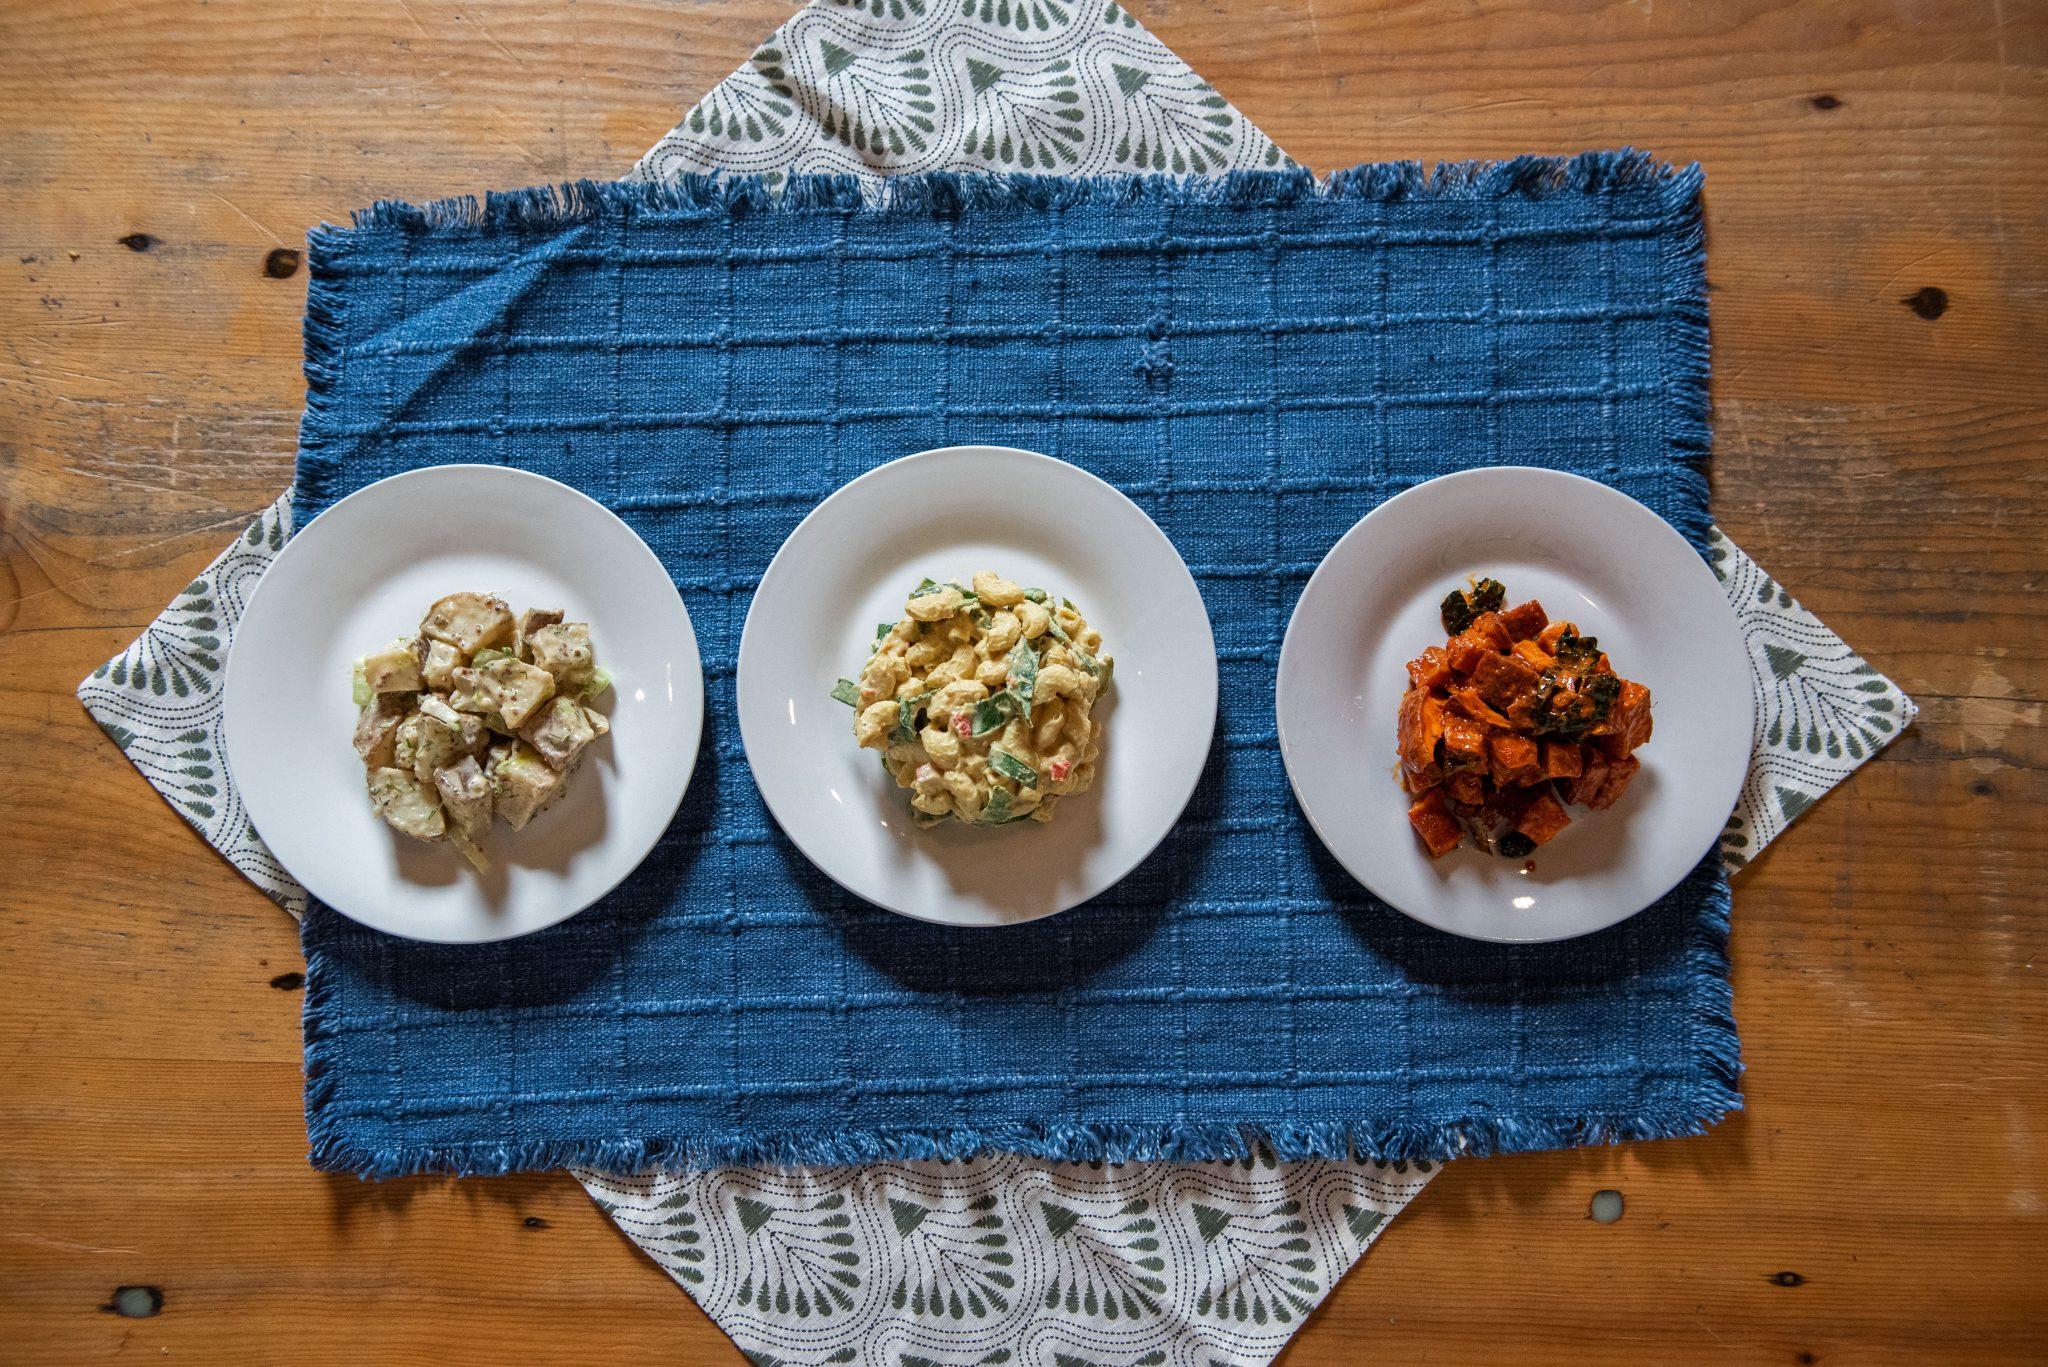 plated food on table